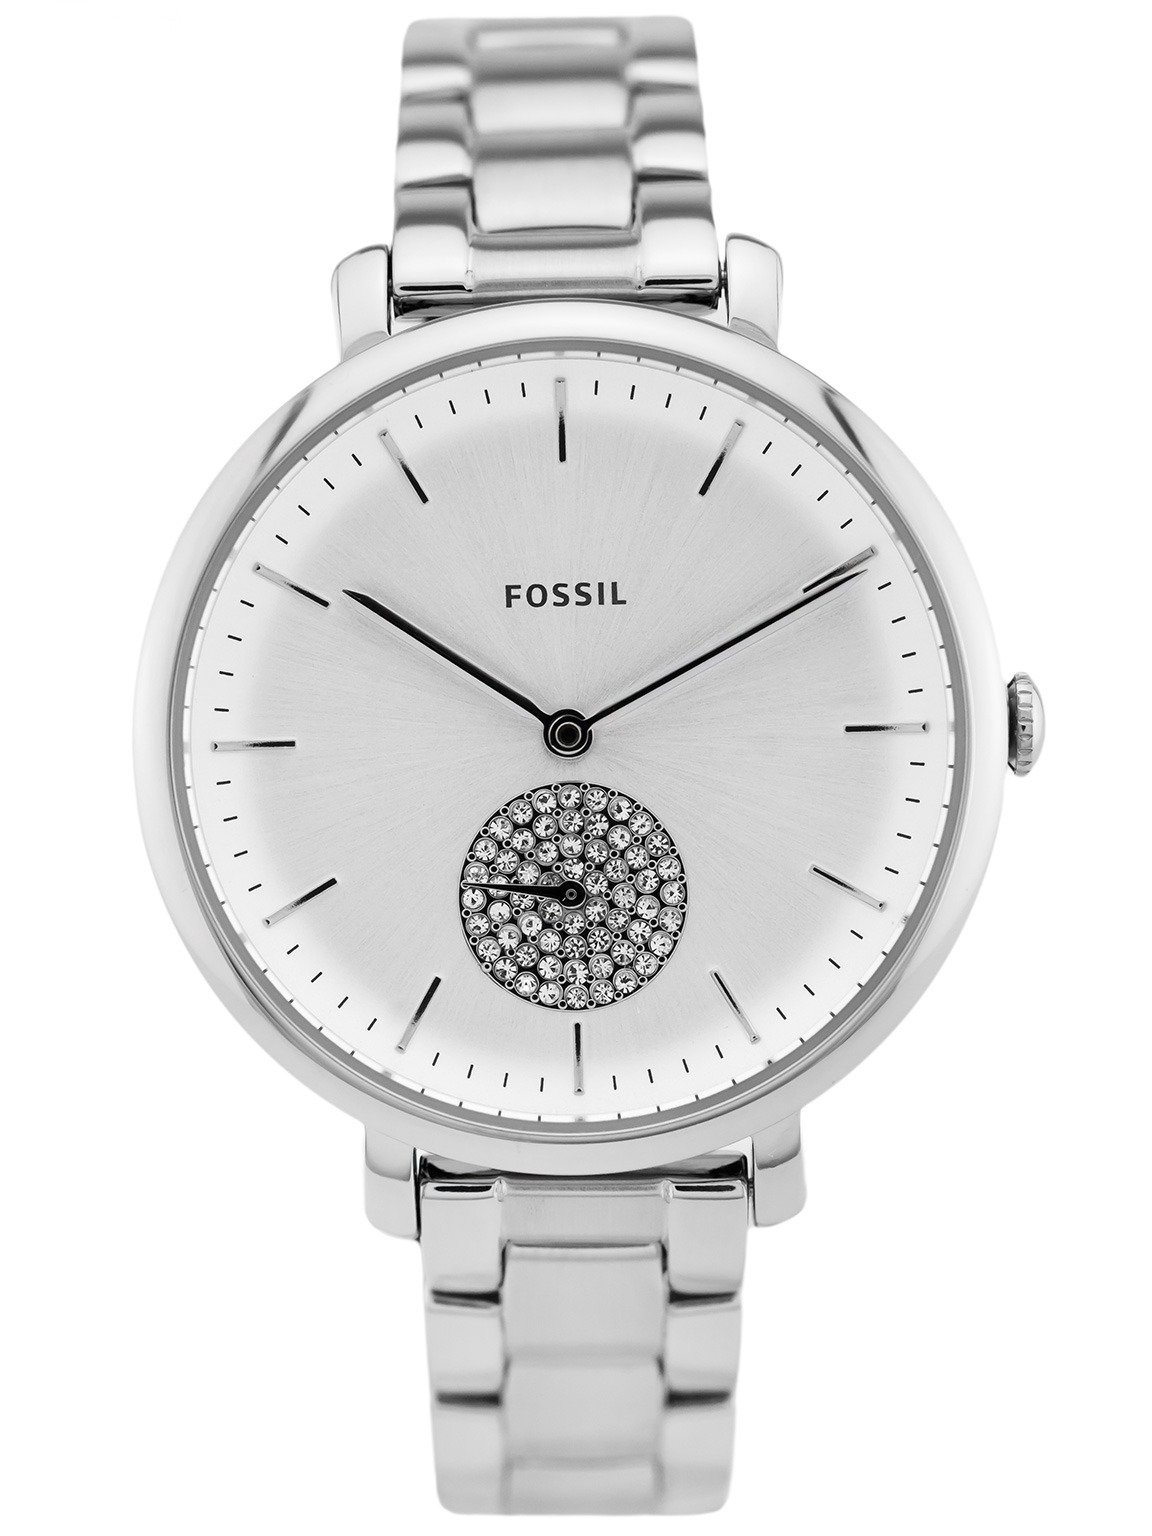 zegarek fossil srebrny na reku